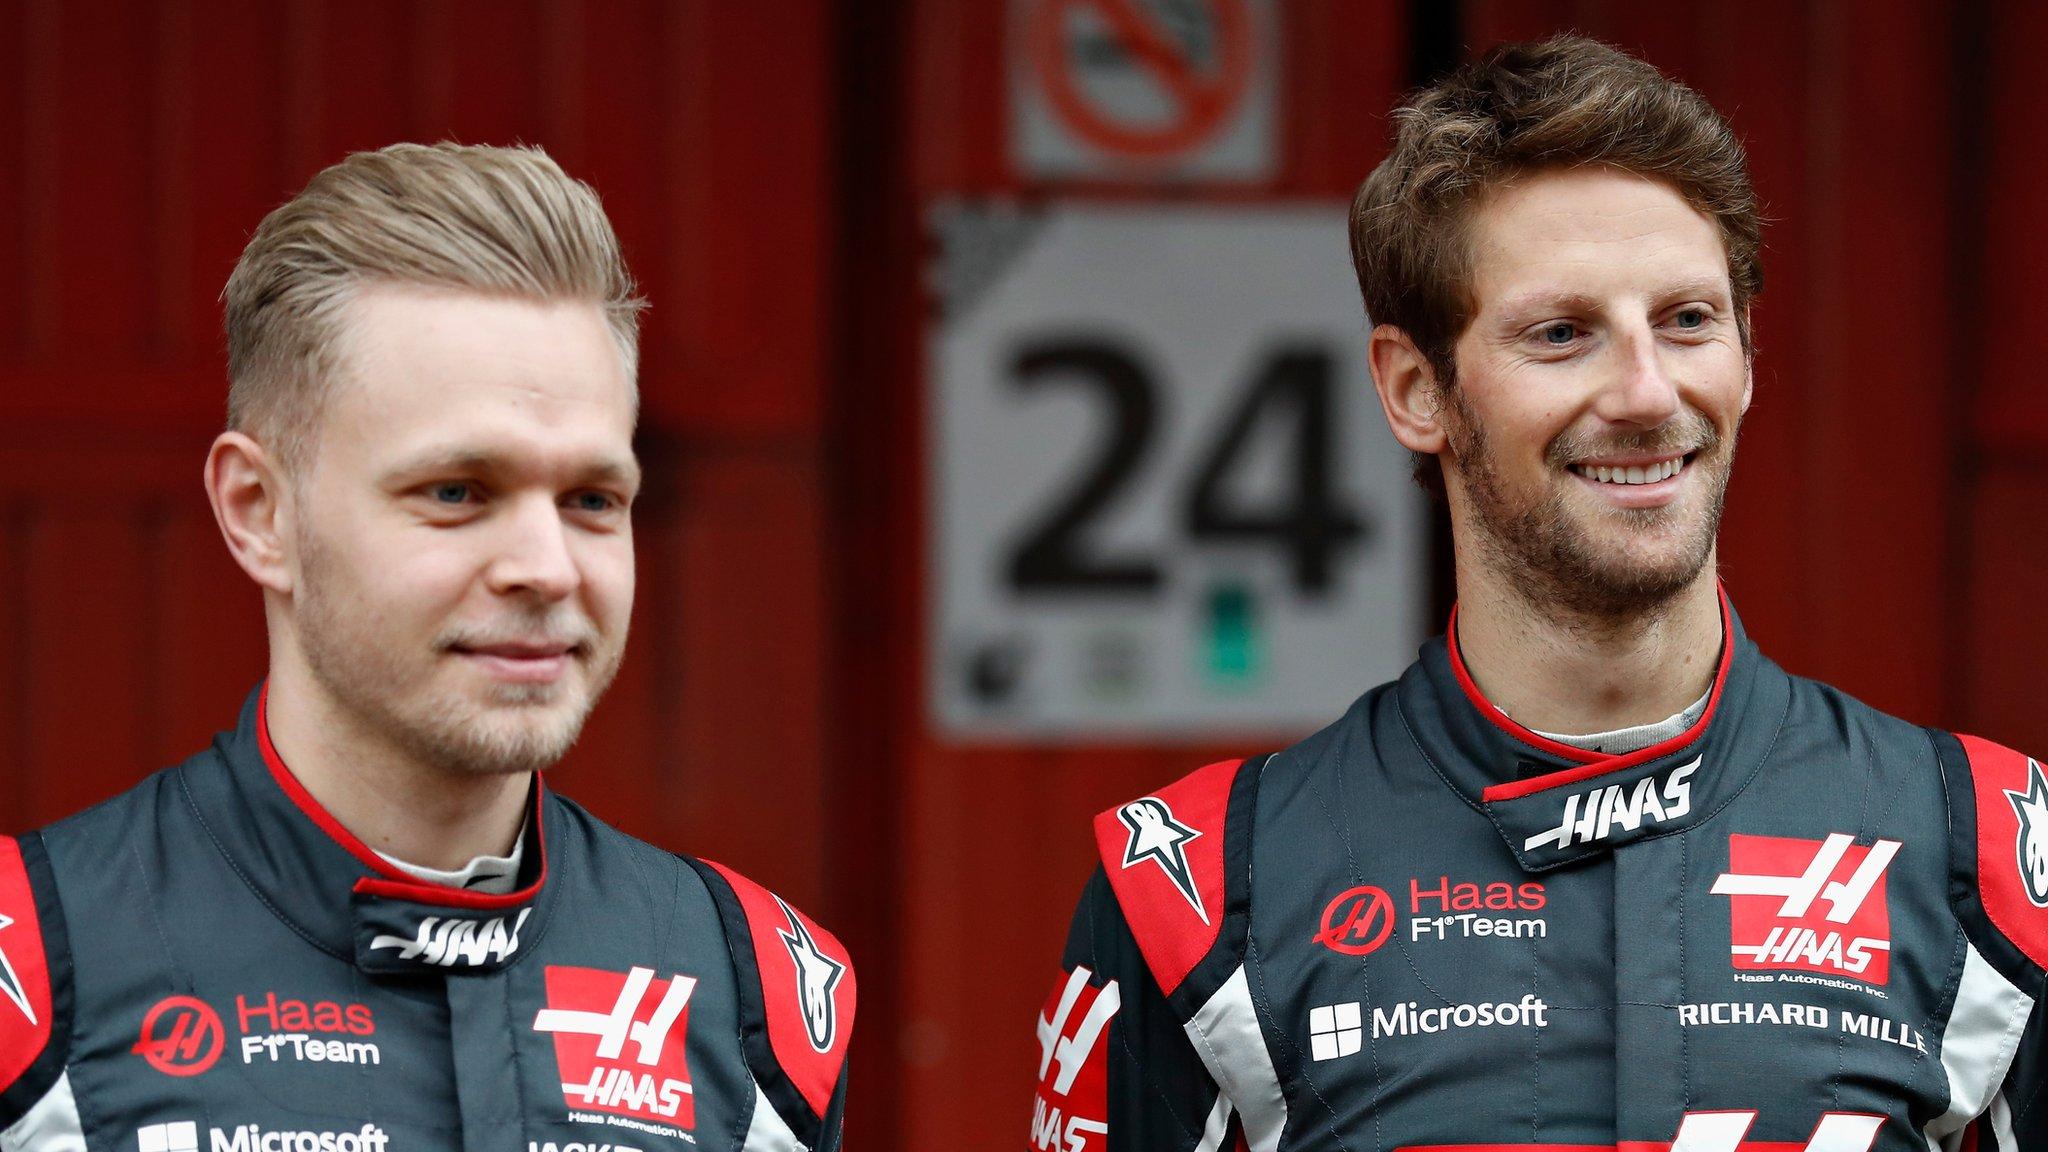 Grosjean & Magnussen to stay at Haas next season